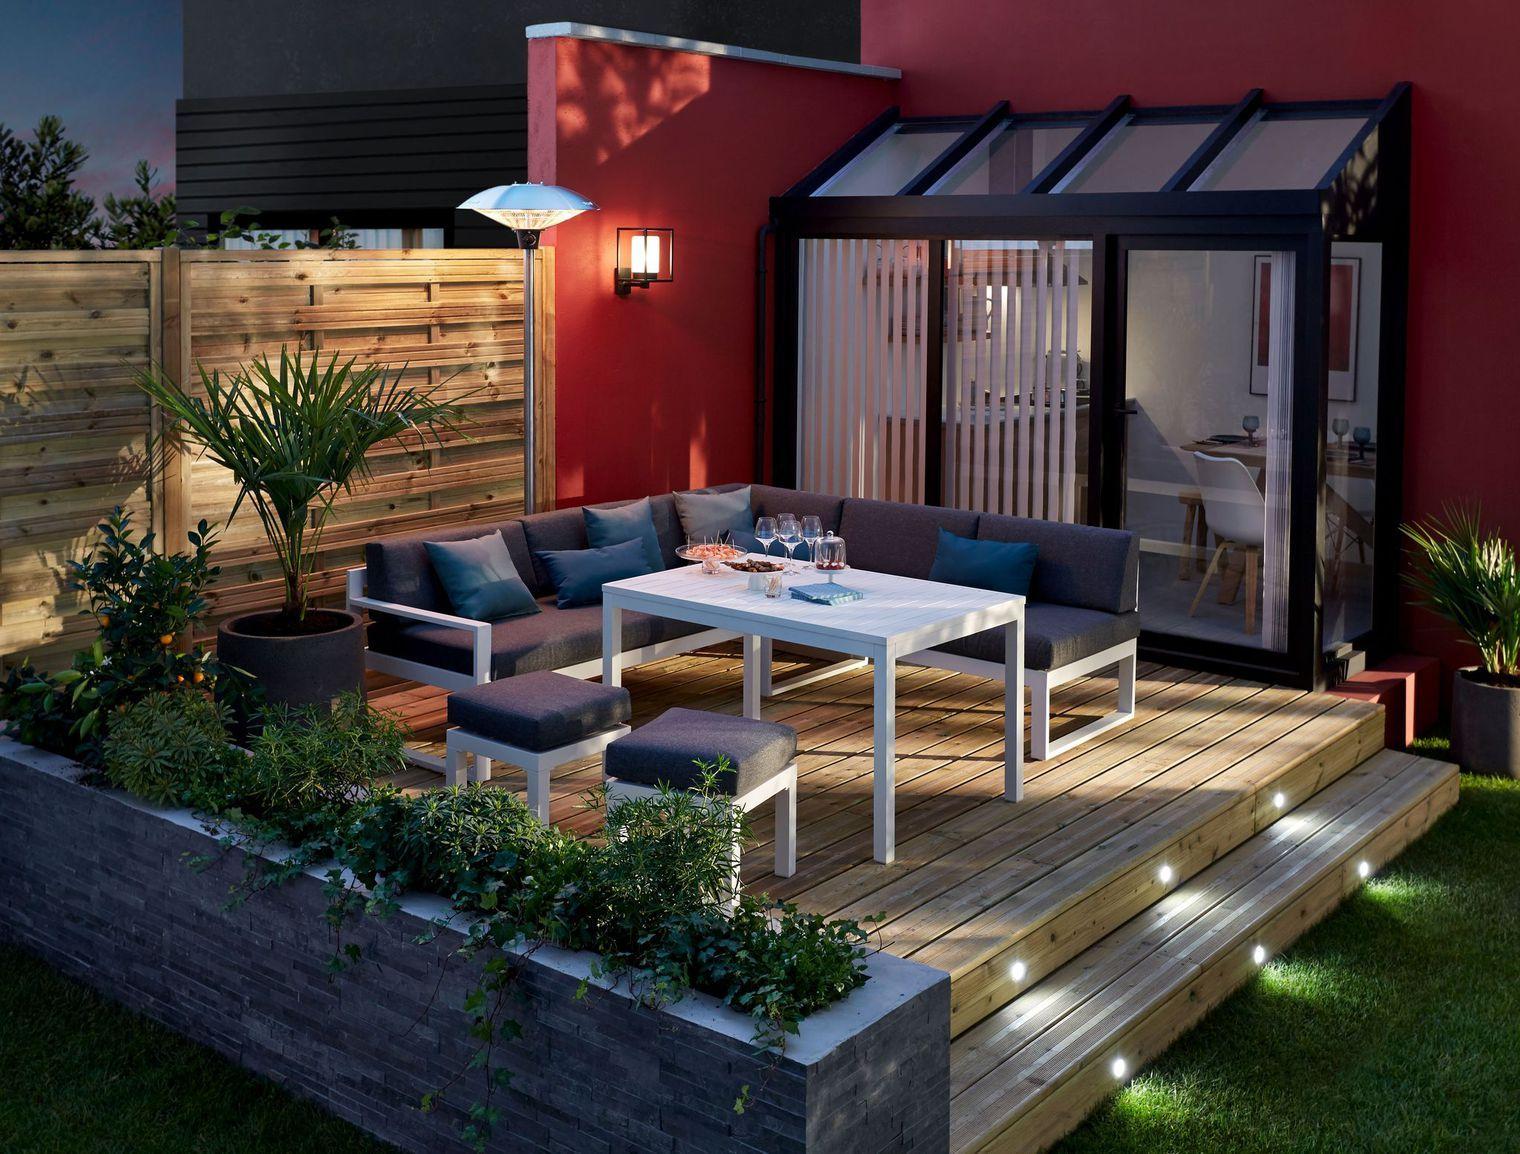 Terrasse sur lev e recherche google jardin inspiration pinterest outdoor spaces coffee - Terrasse jardin pinterest strasbourg ...